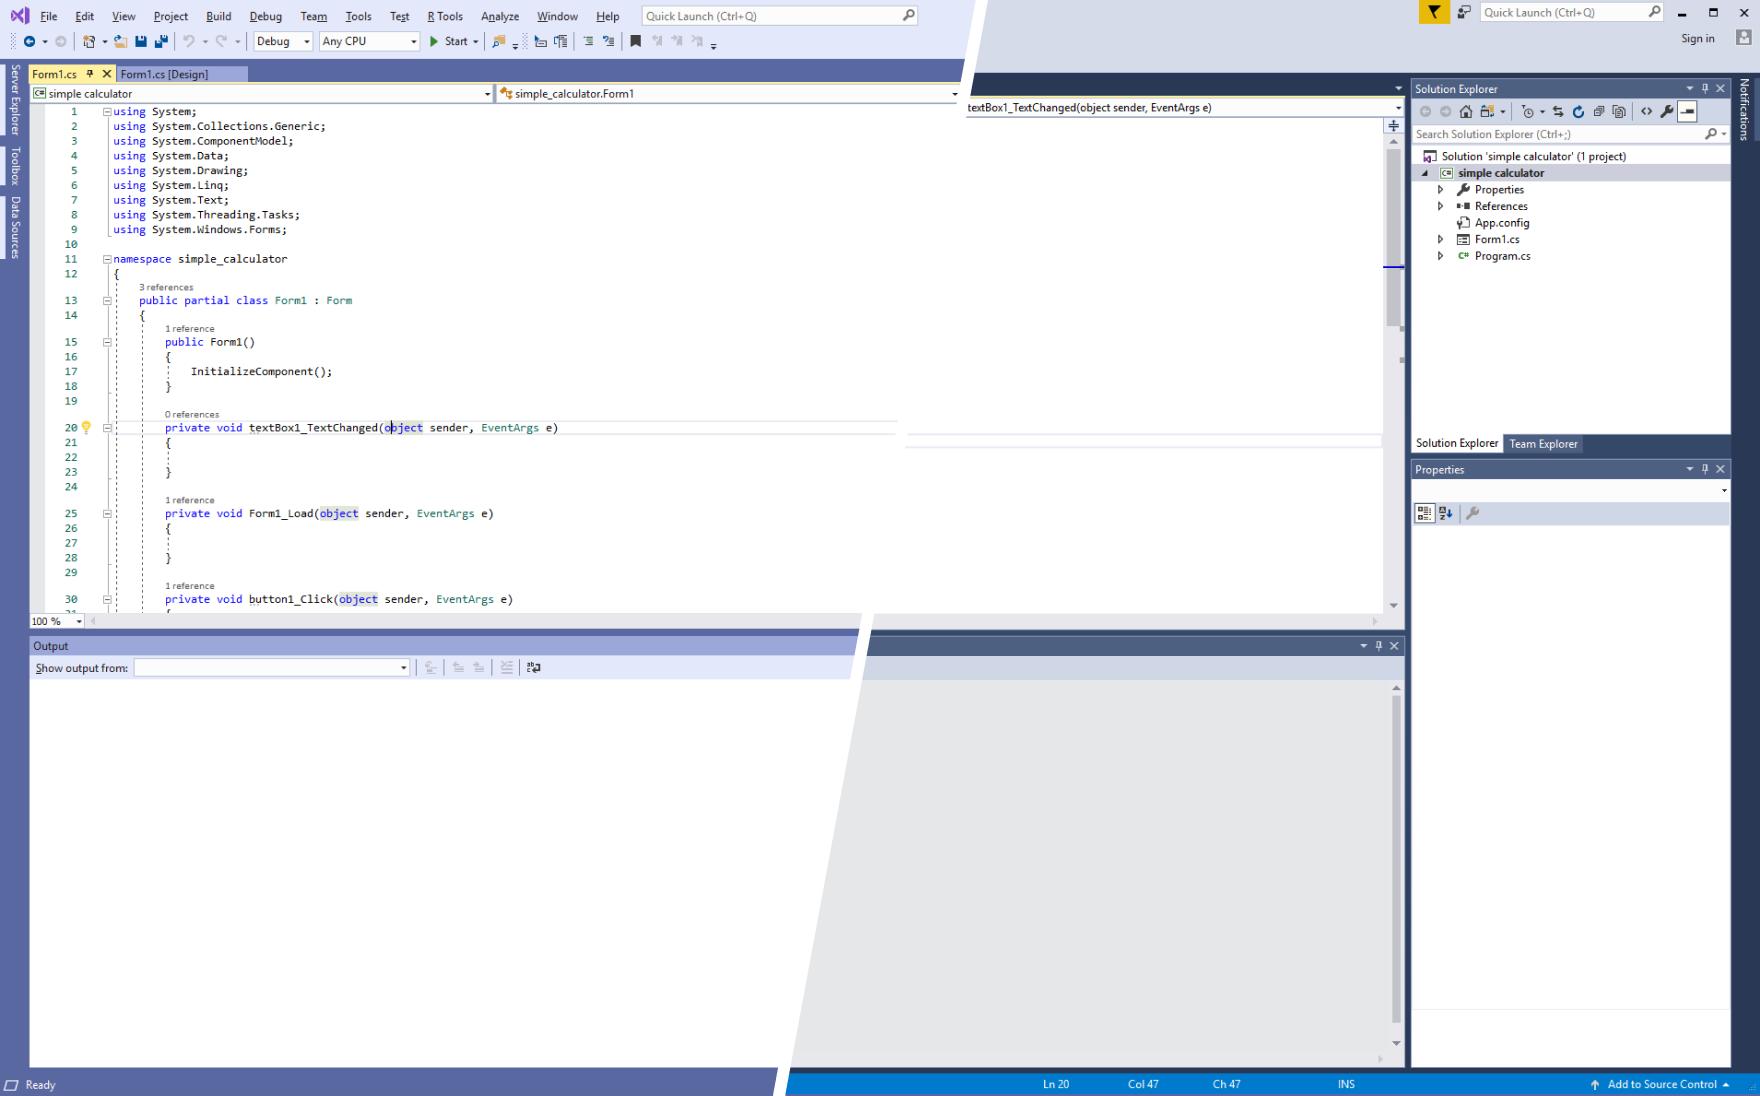 Visual Studio 2019 Preview 2 Blog Rollup Visual-Studo-theme-comparison.png